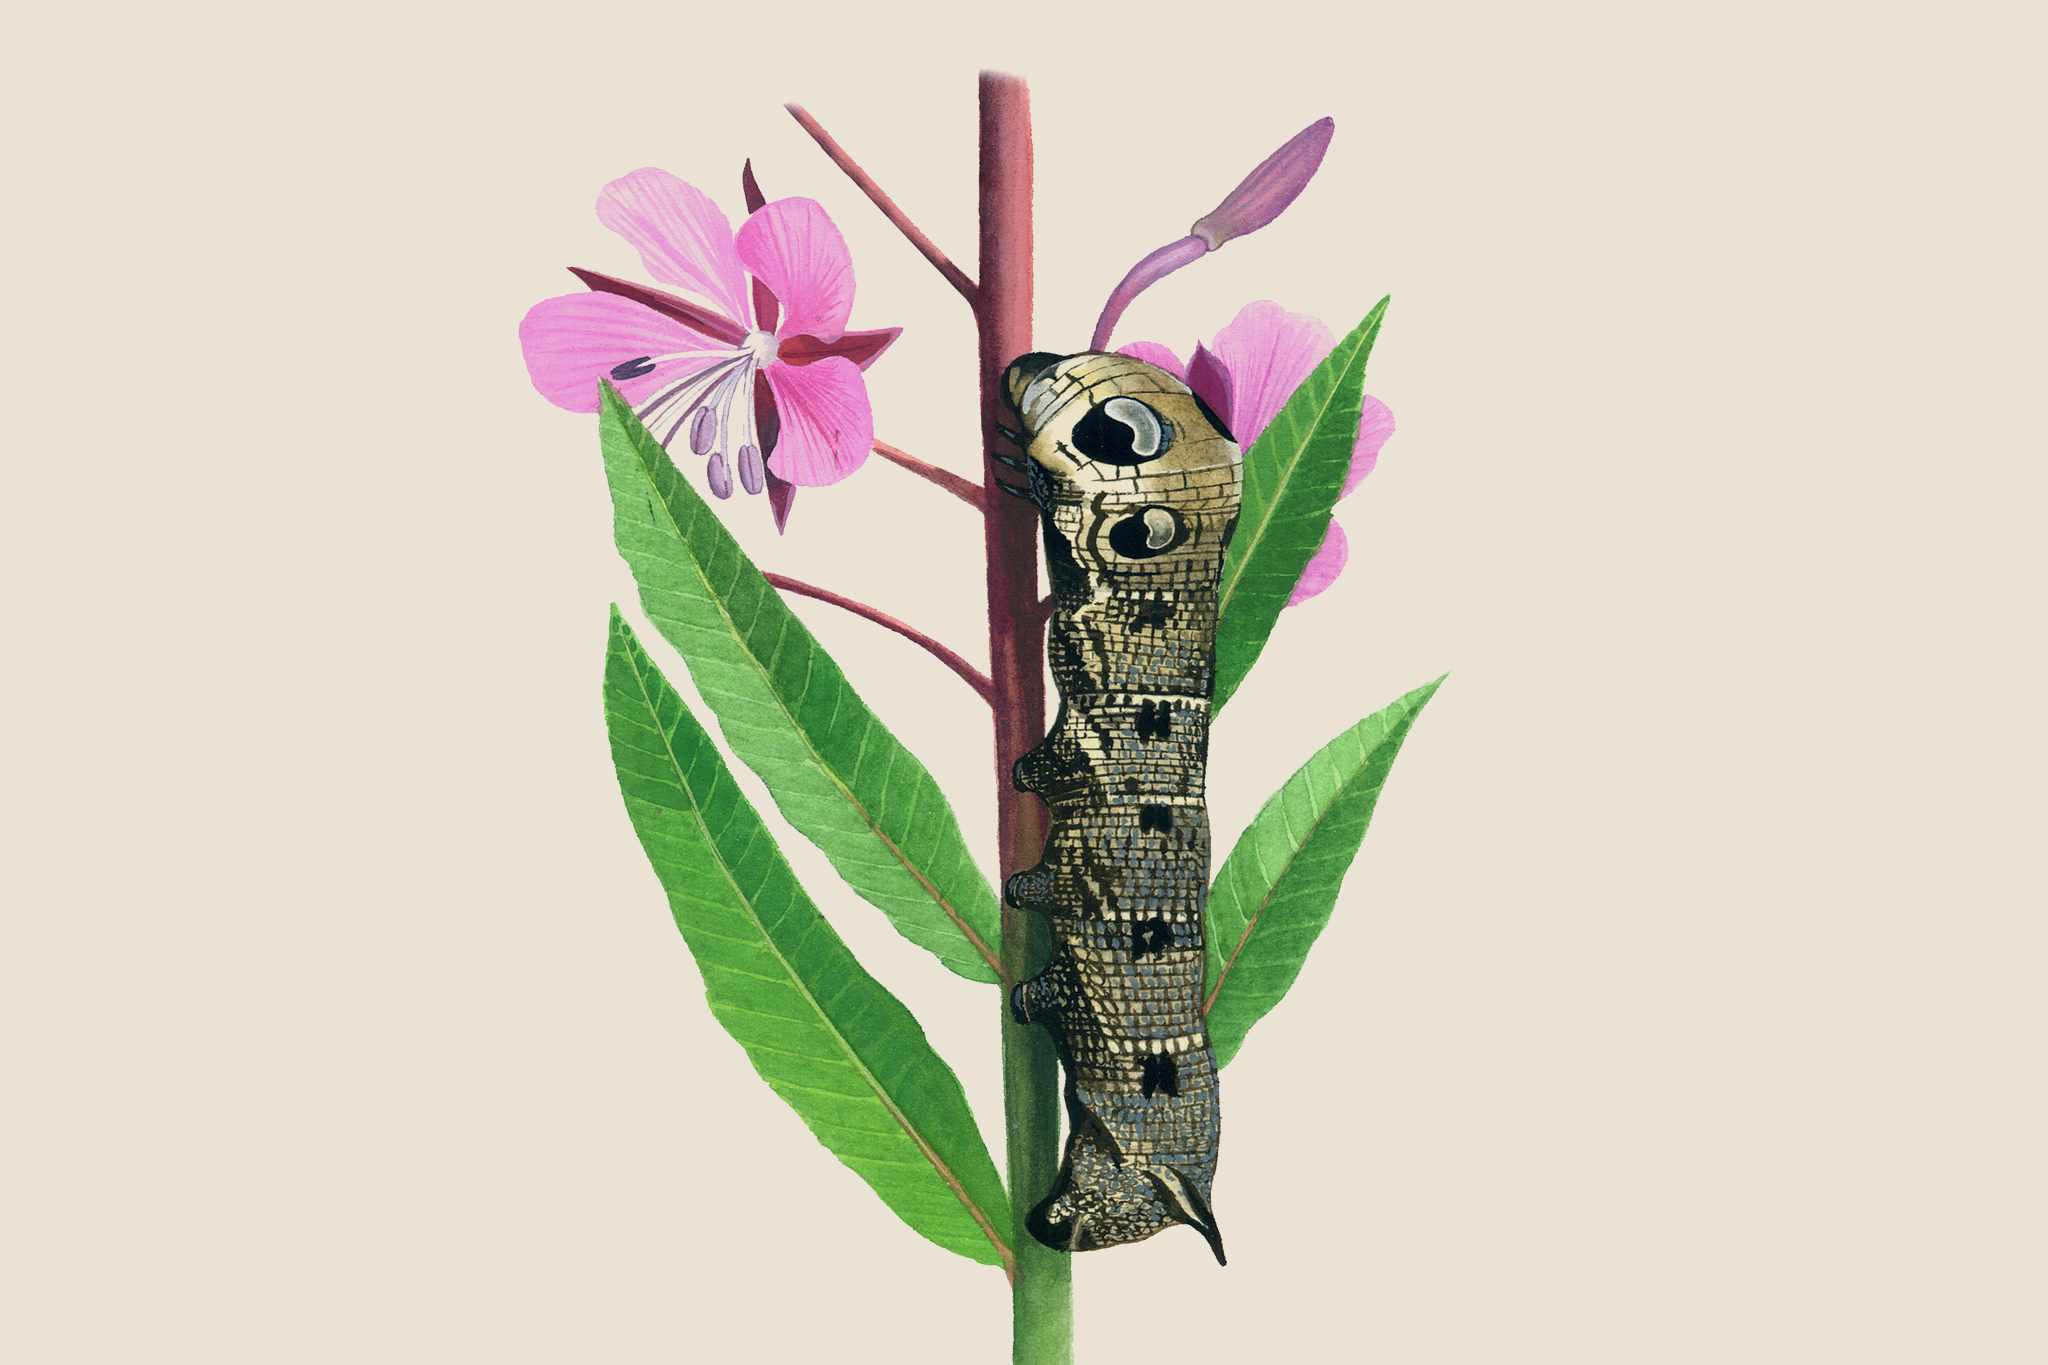 Garden Wildlife Identifier: Caterpillars